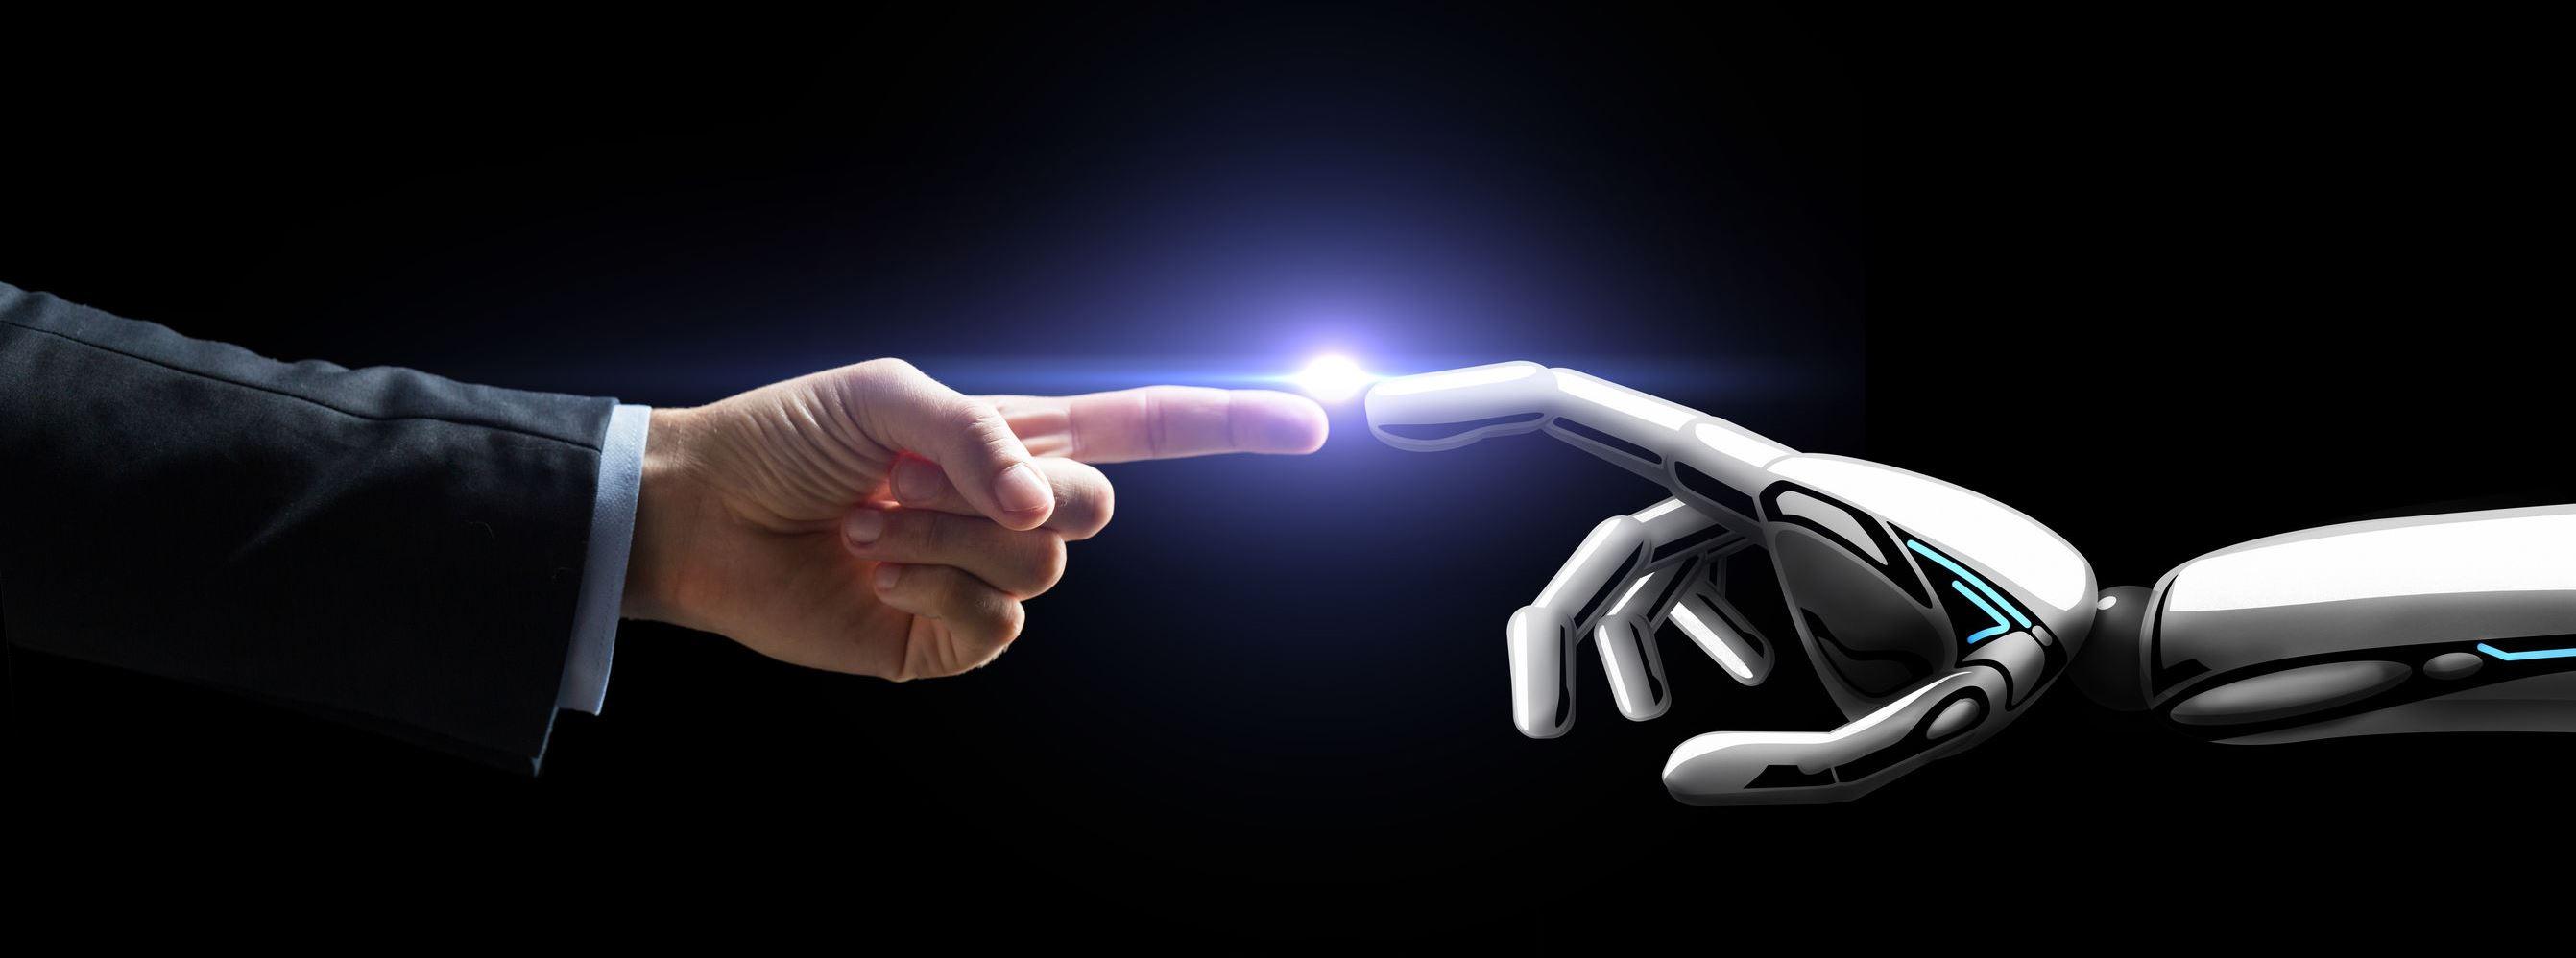 Human Factors in Artificial Intelligence | Thales Aerospace BlogThales  Aerospace Blog